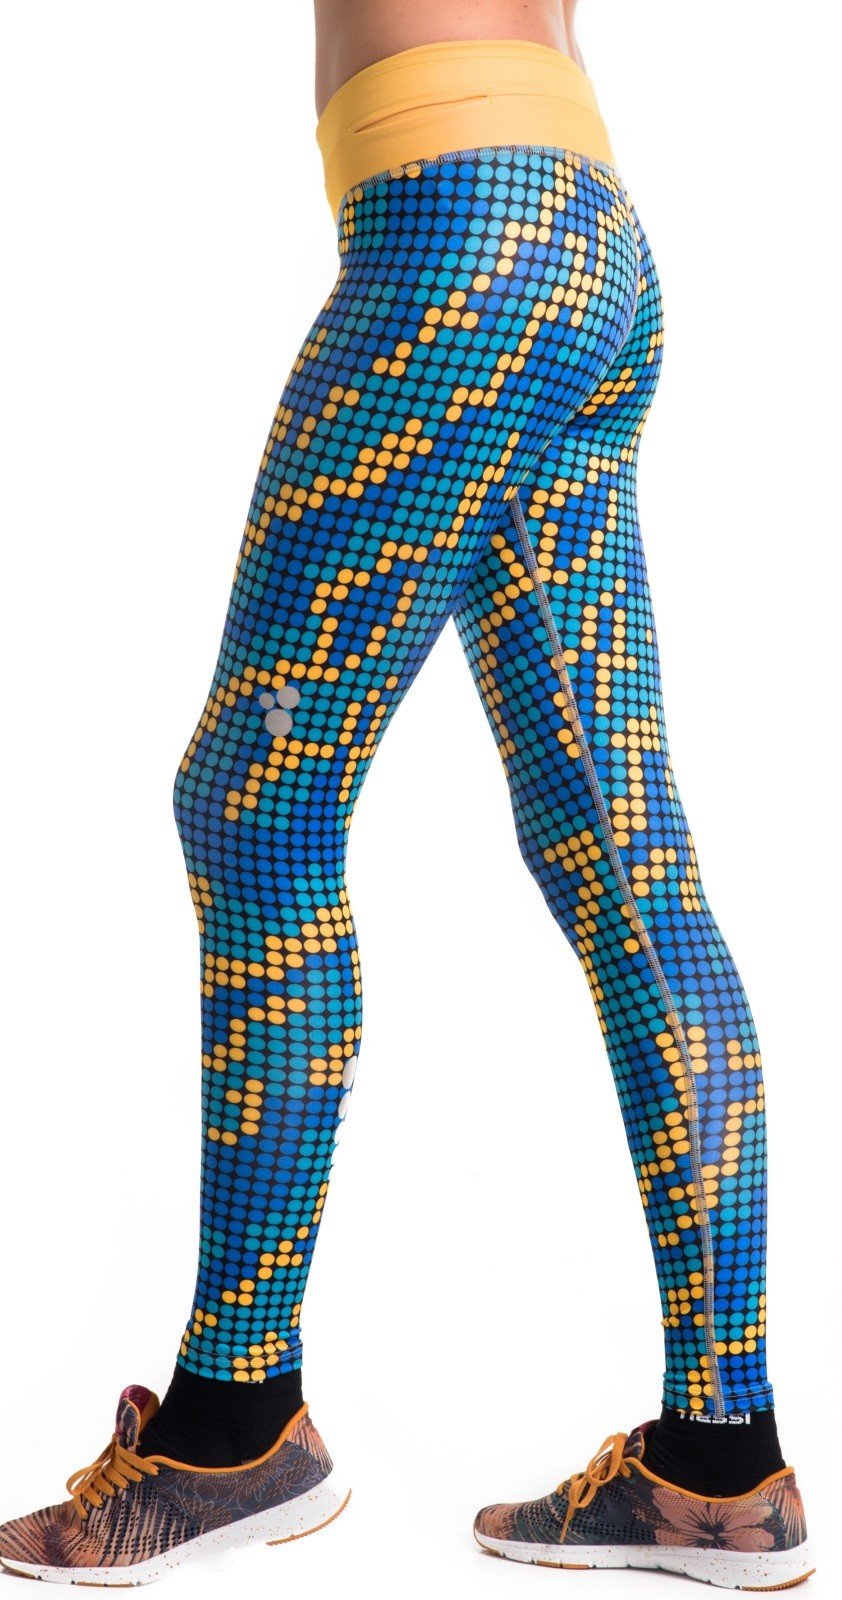 nessi damen sport leggings oslp laufhose fitnesshose. Black Bedroom Furniture Sets. Home Design Ideas